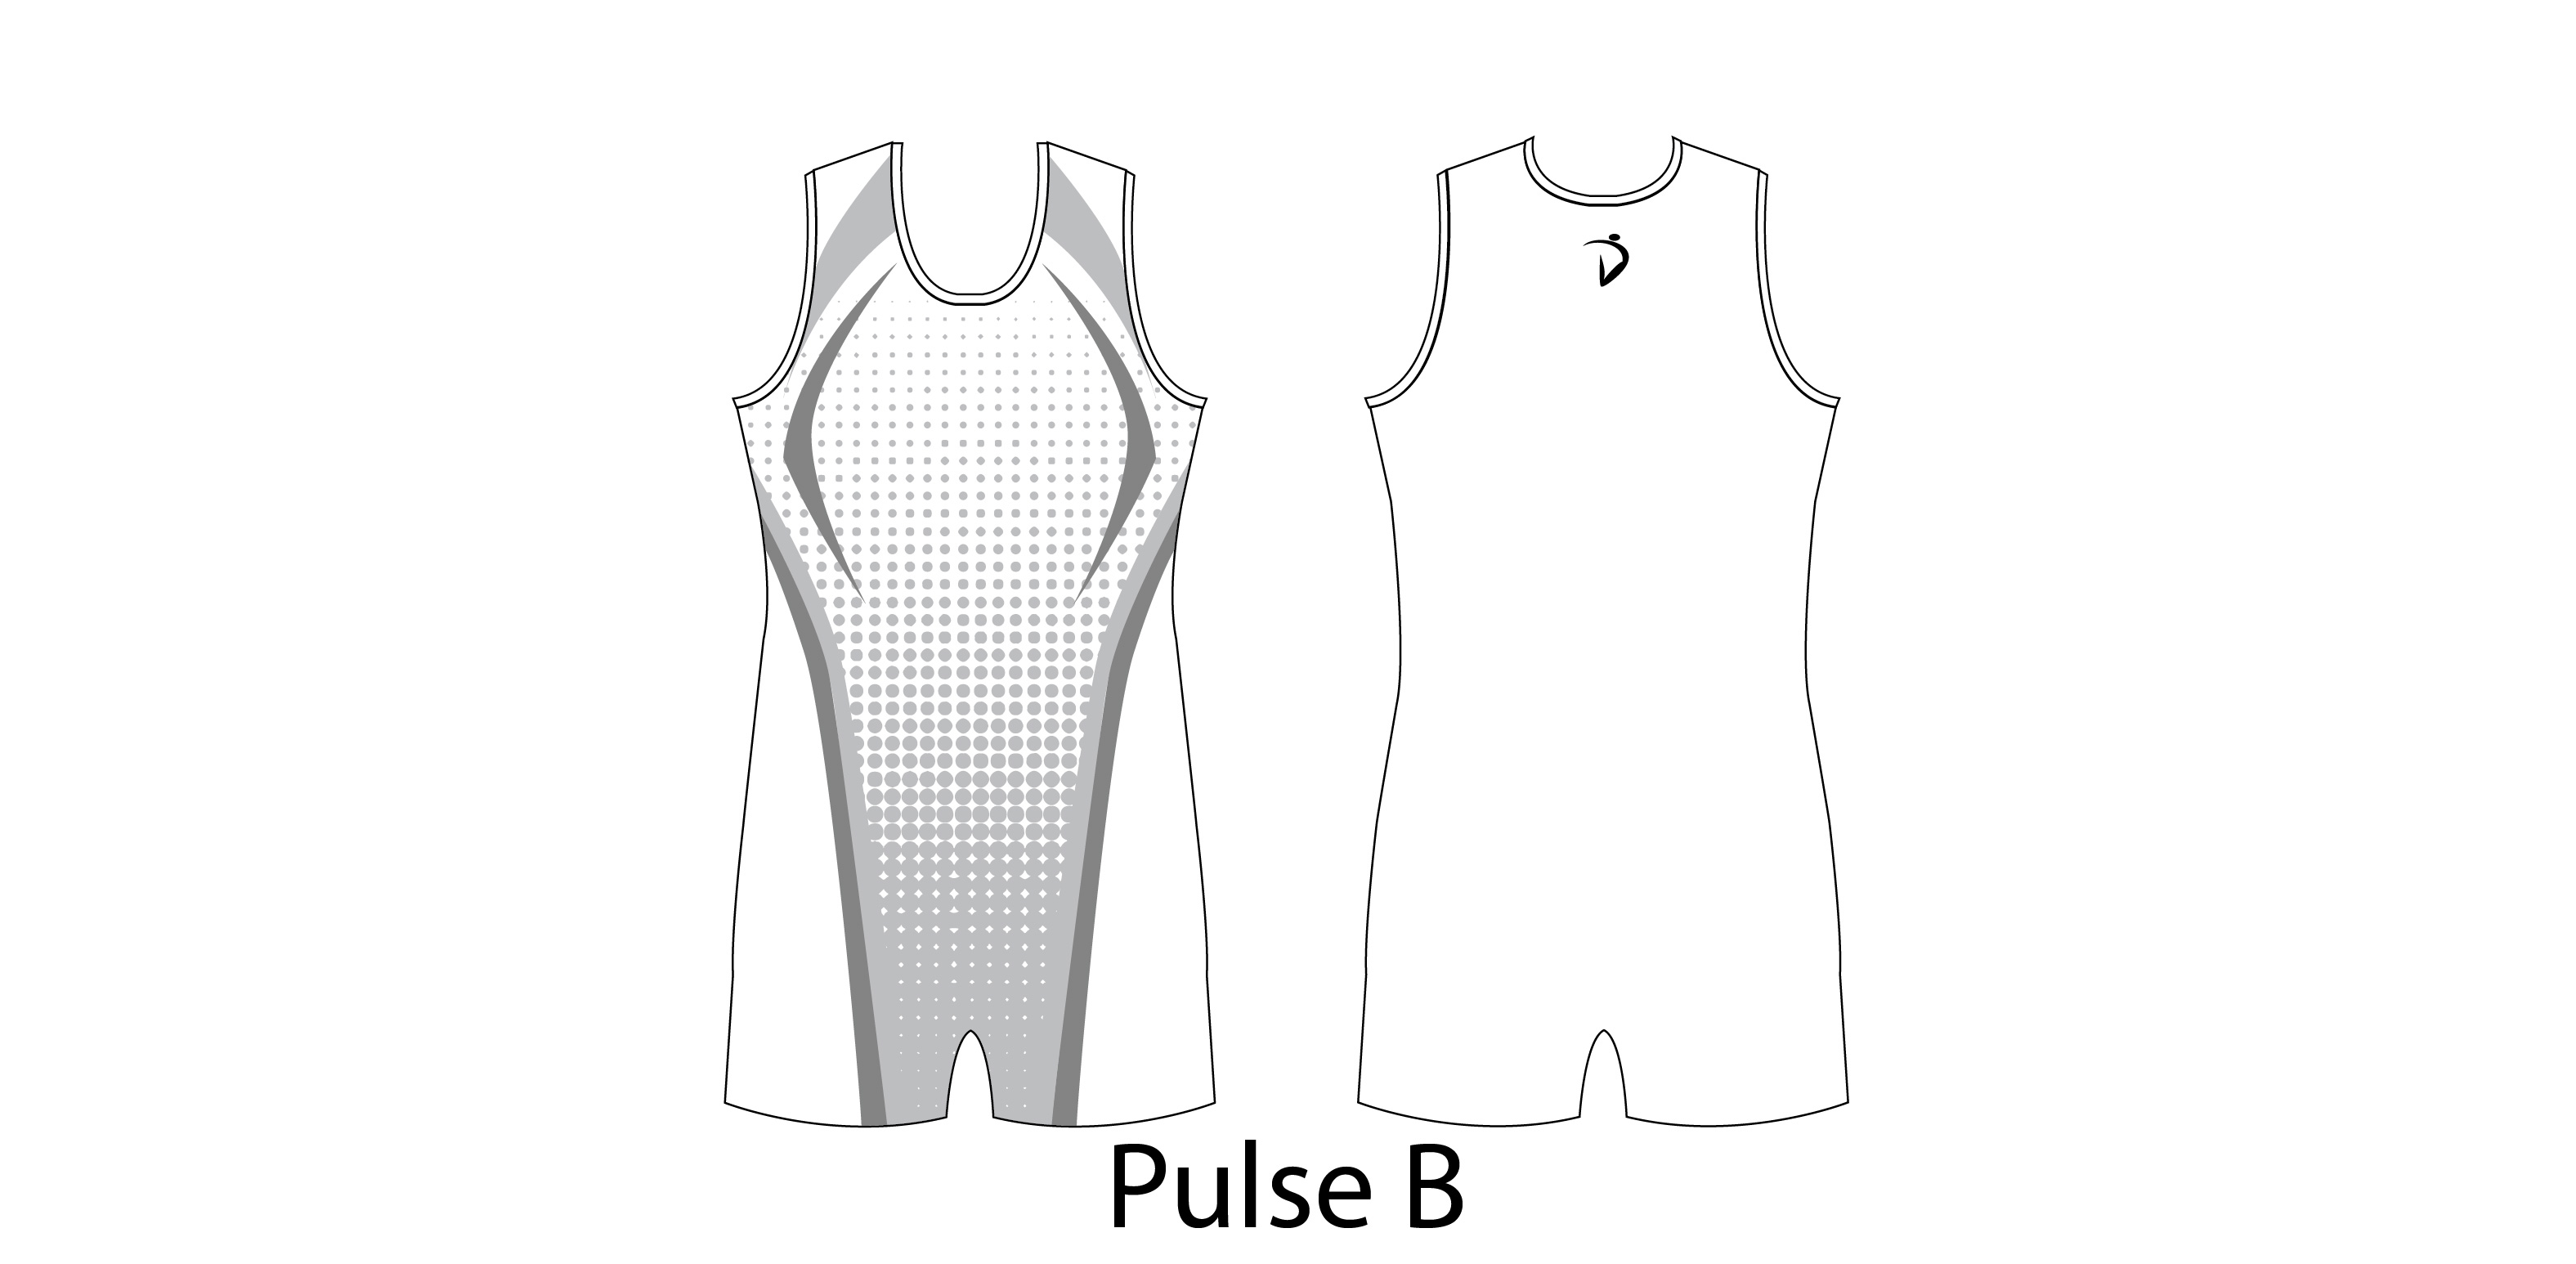 Pulse B